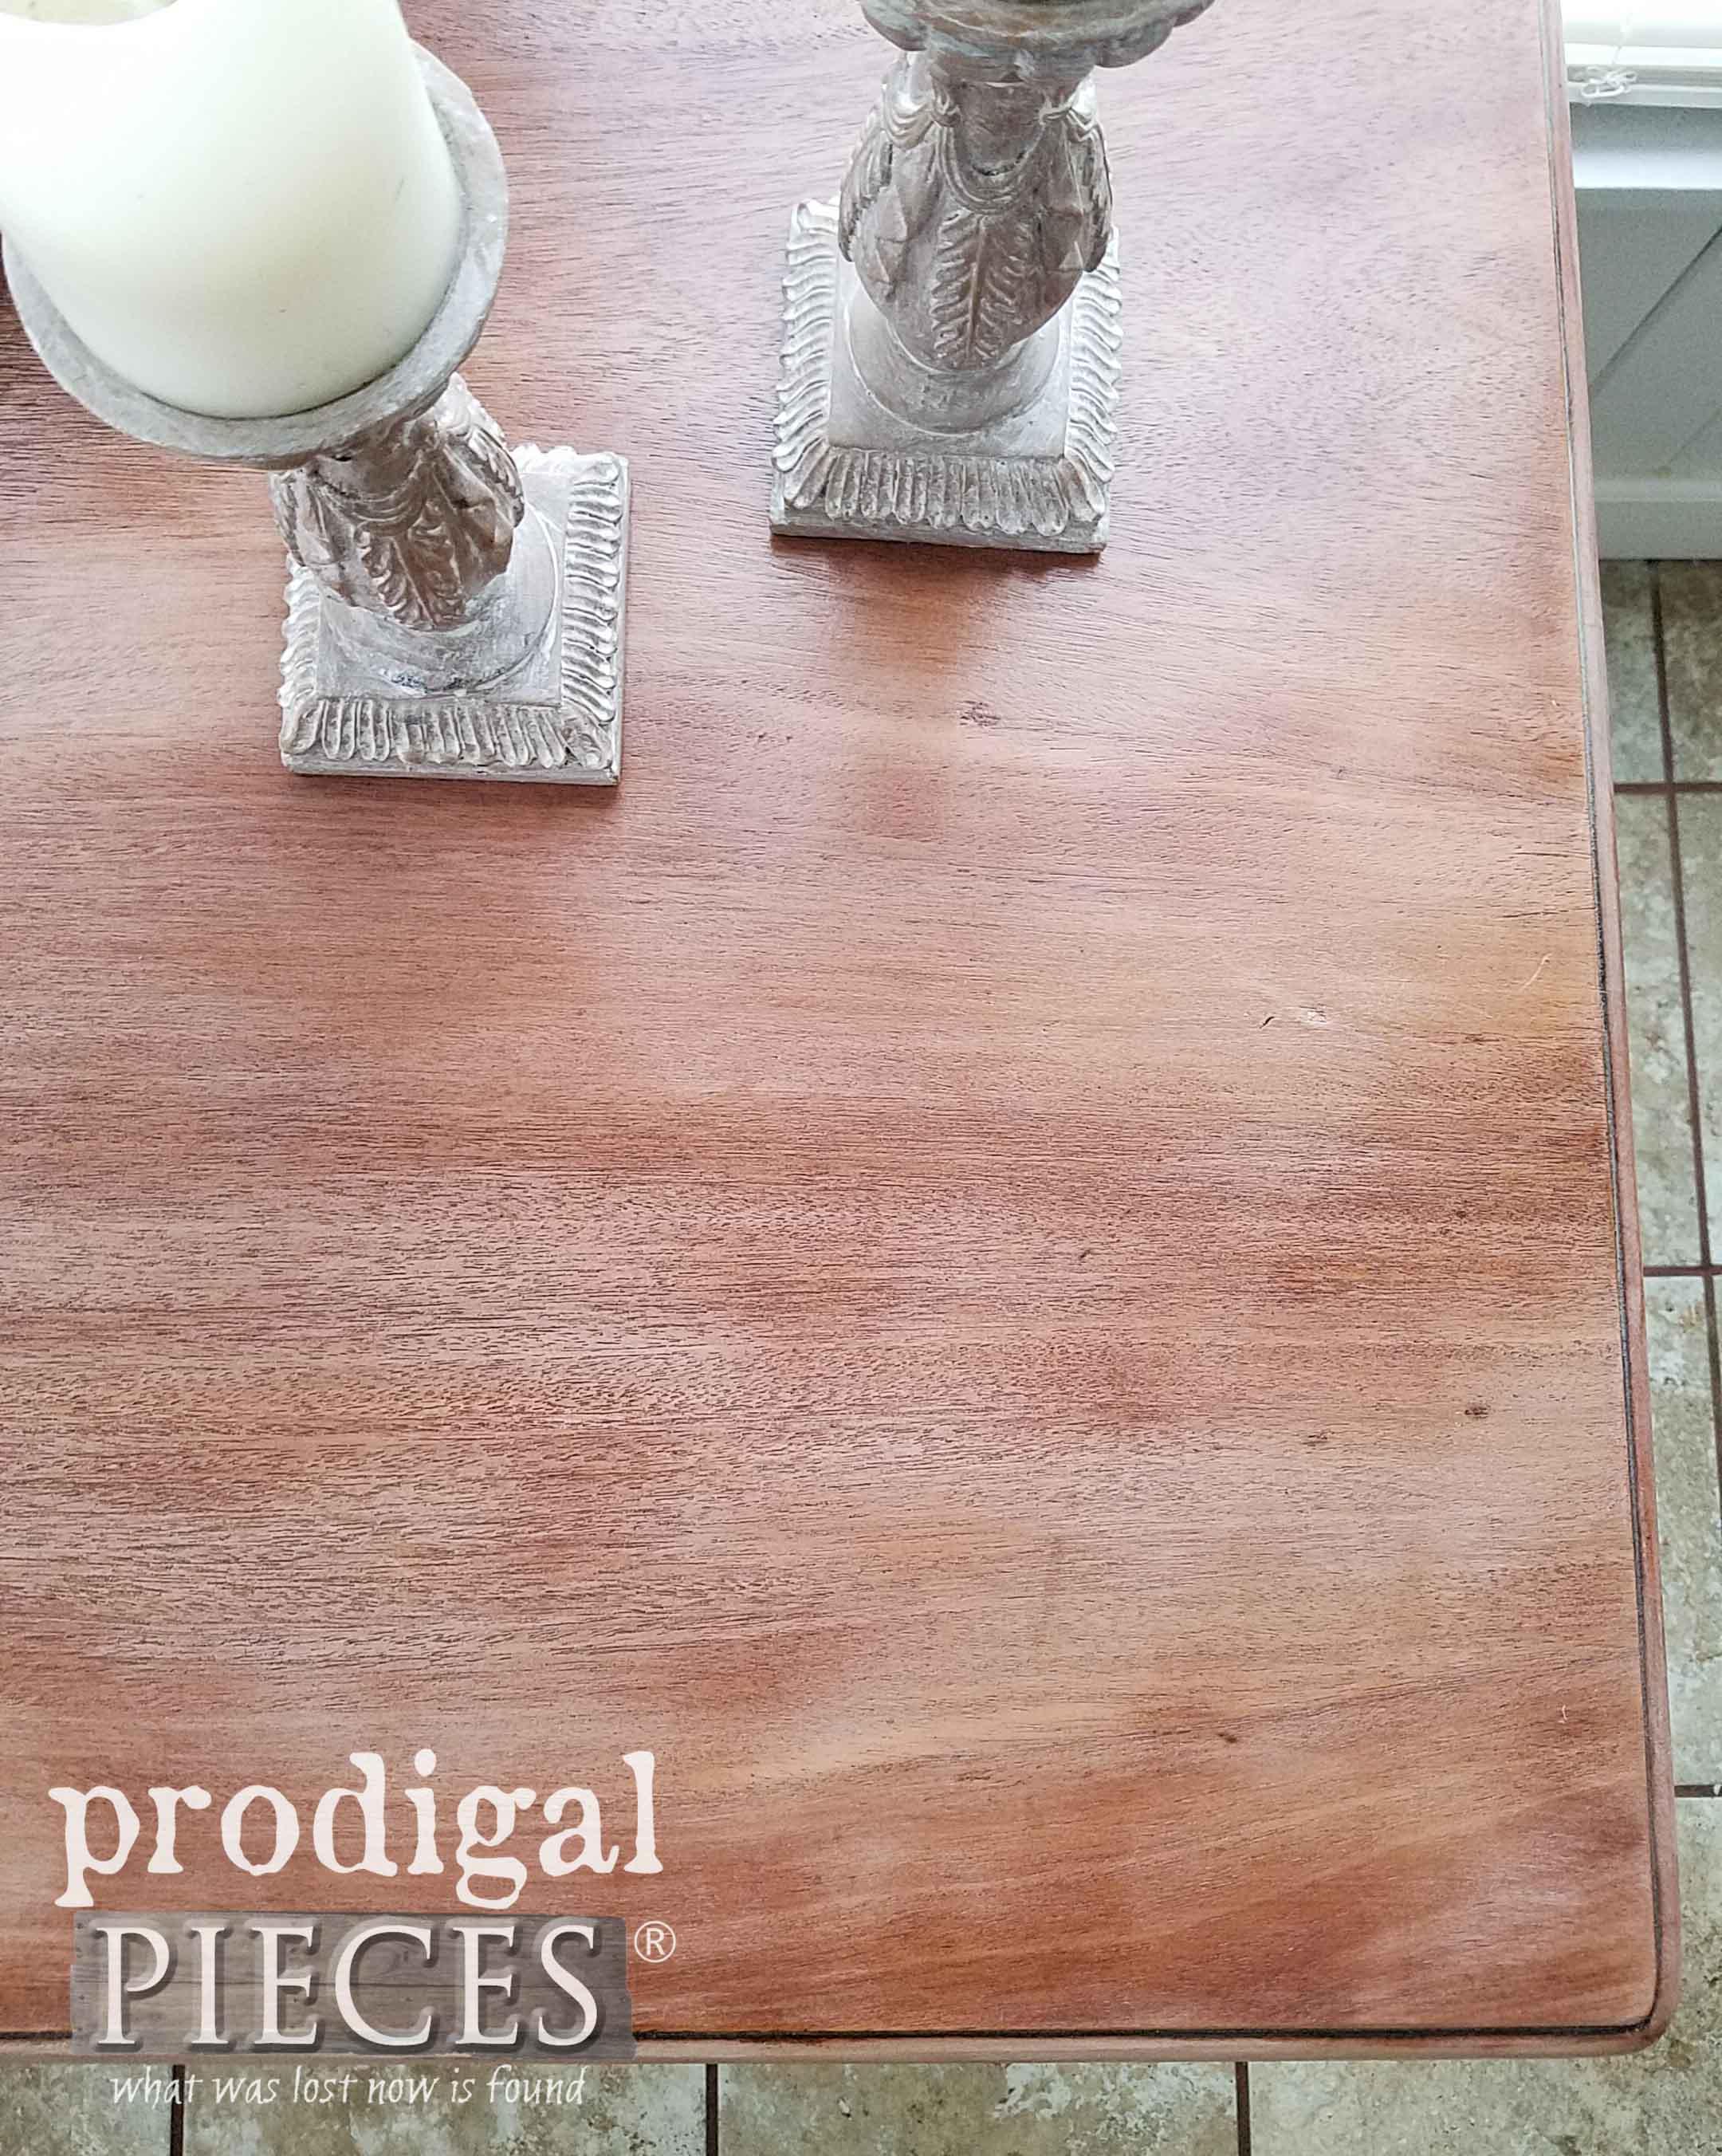 Antique Mahogany Larkin Company Table Top with New Look   prodigalpieces.com